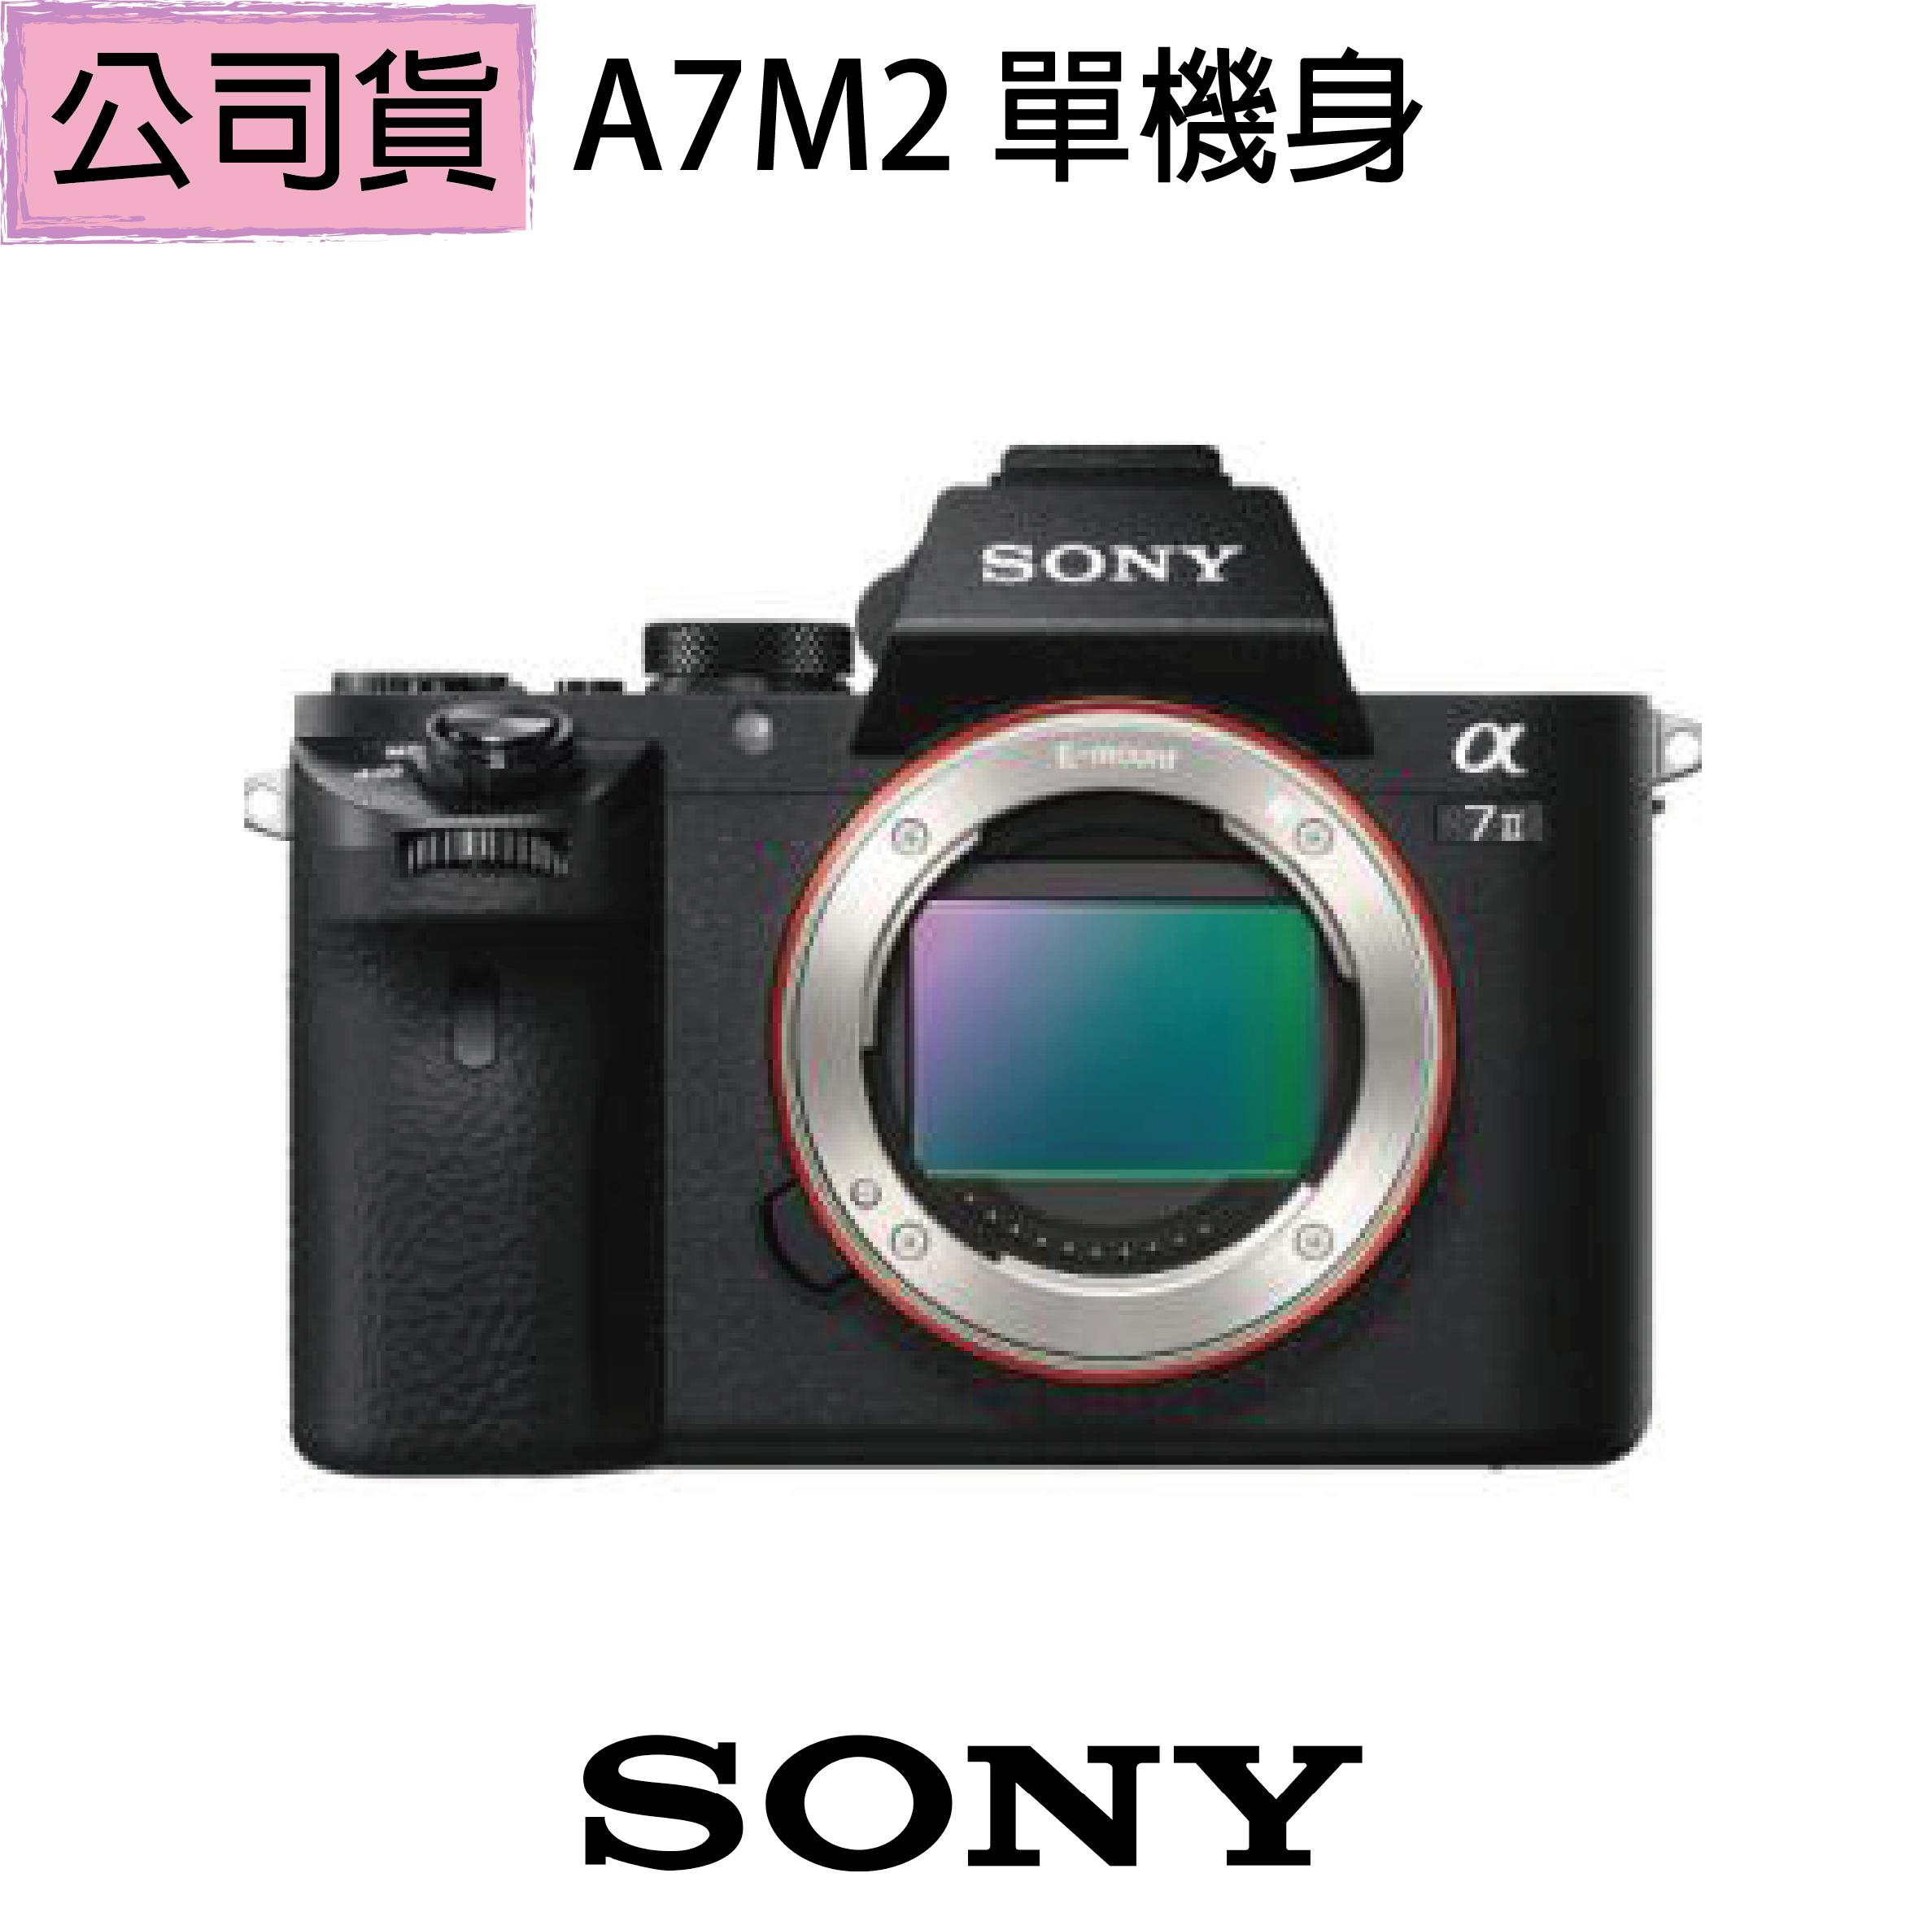 【SONY】ILCE-7M2 單機身A7M2 (公司貨)